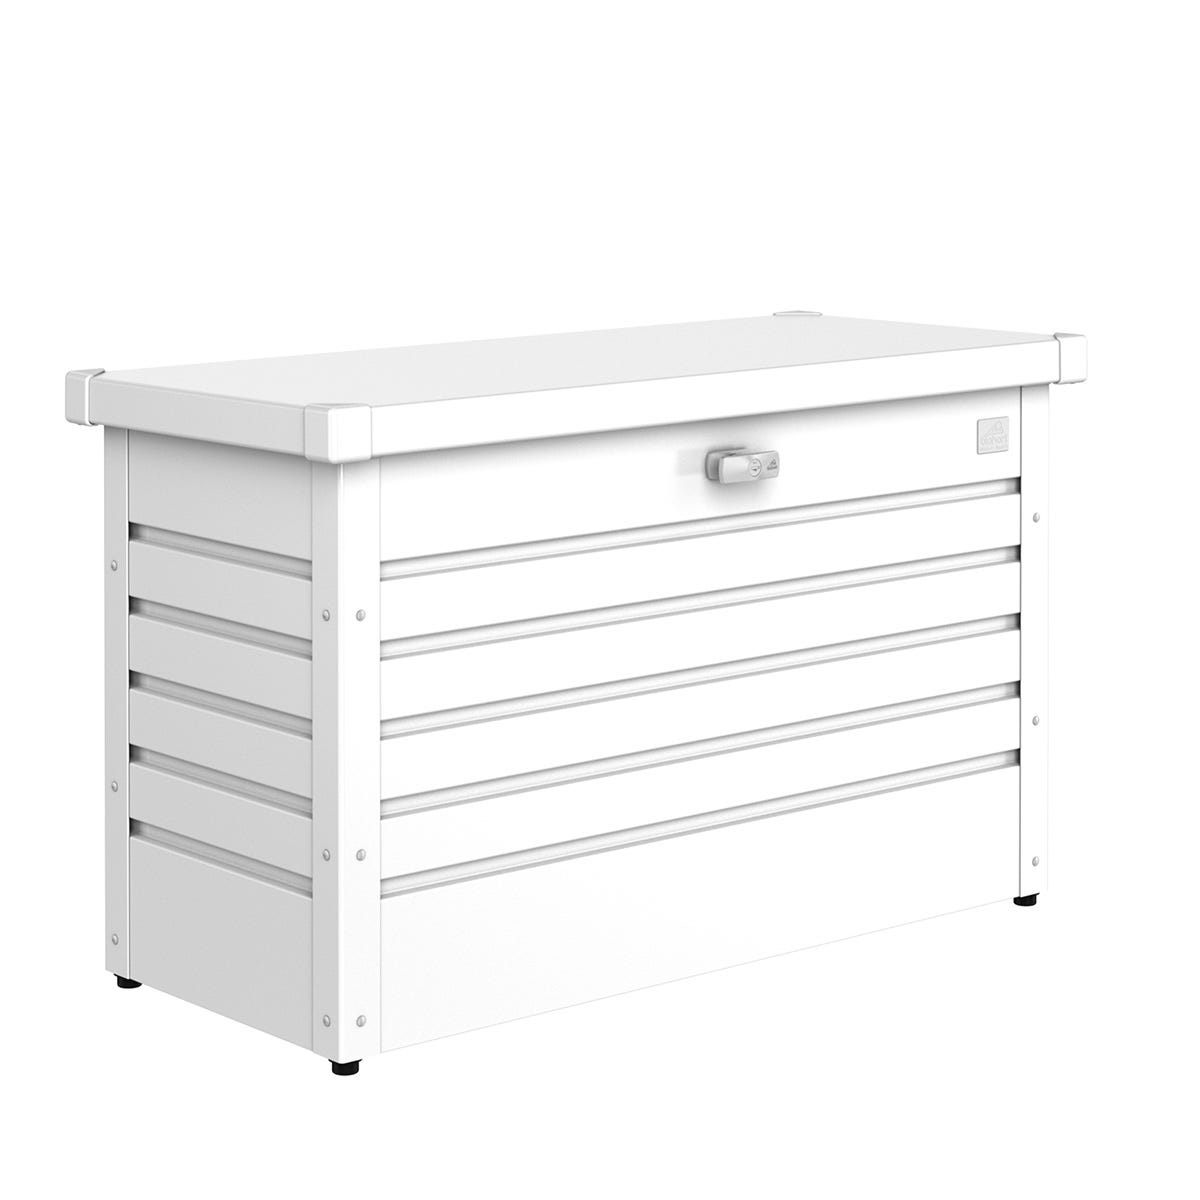 Biohort LeisureTime 3' x 1' Storage Box 100 - White